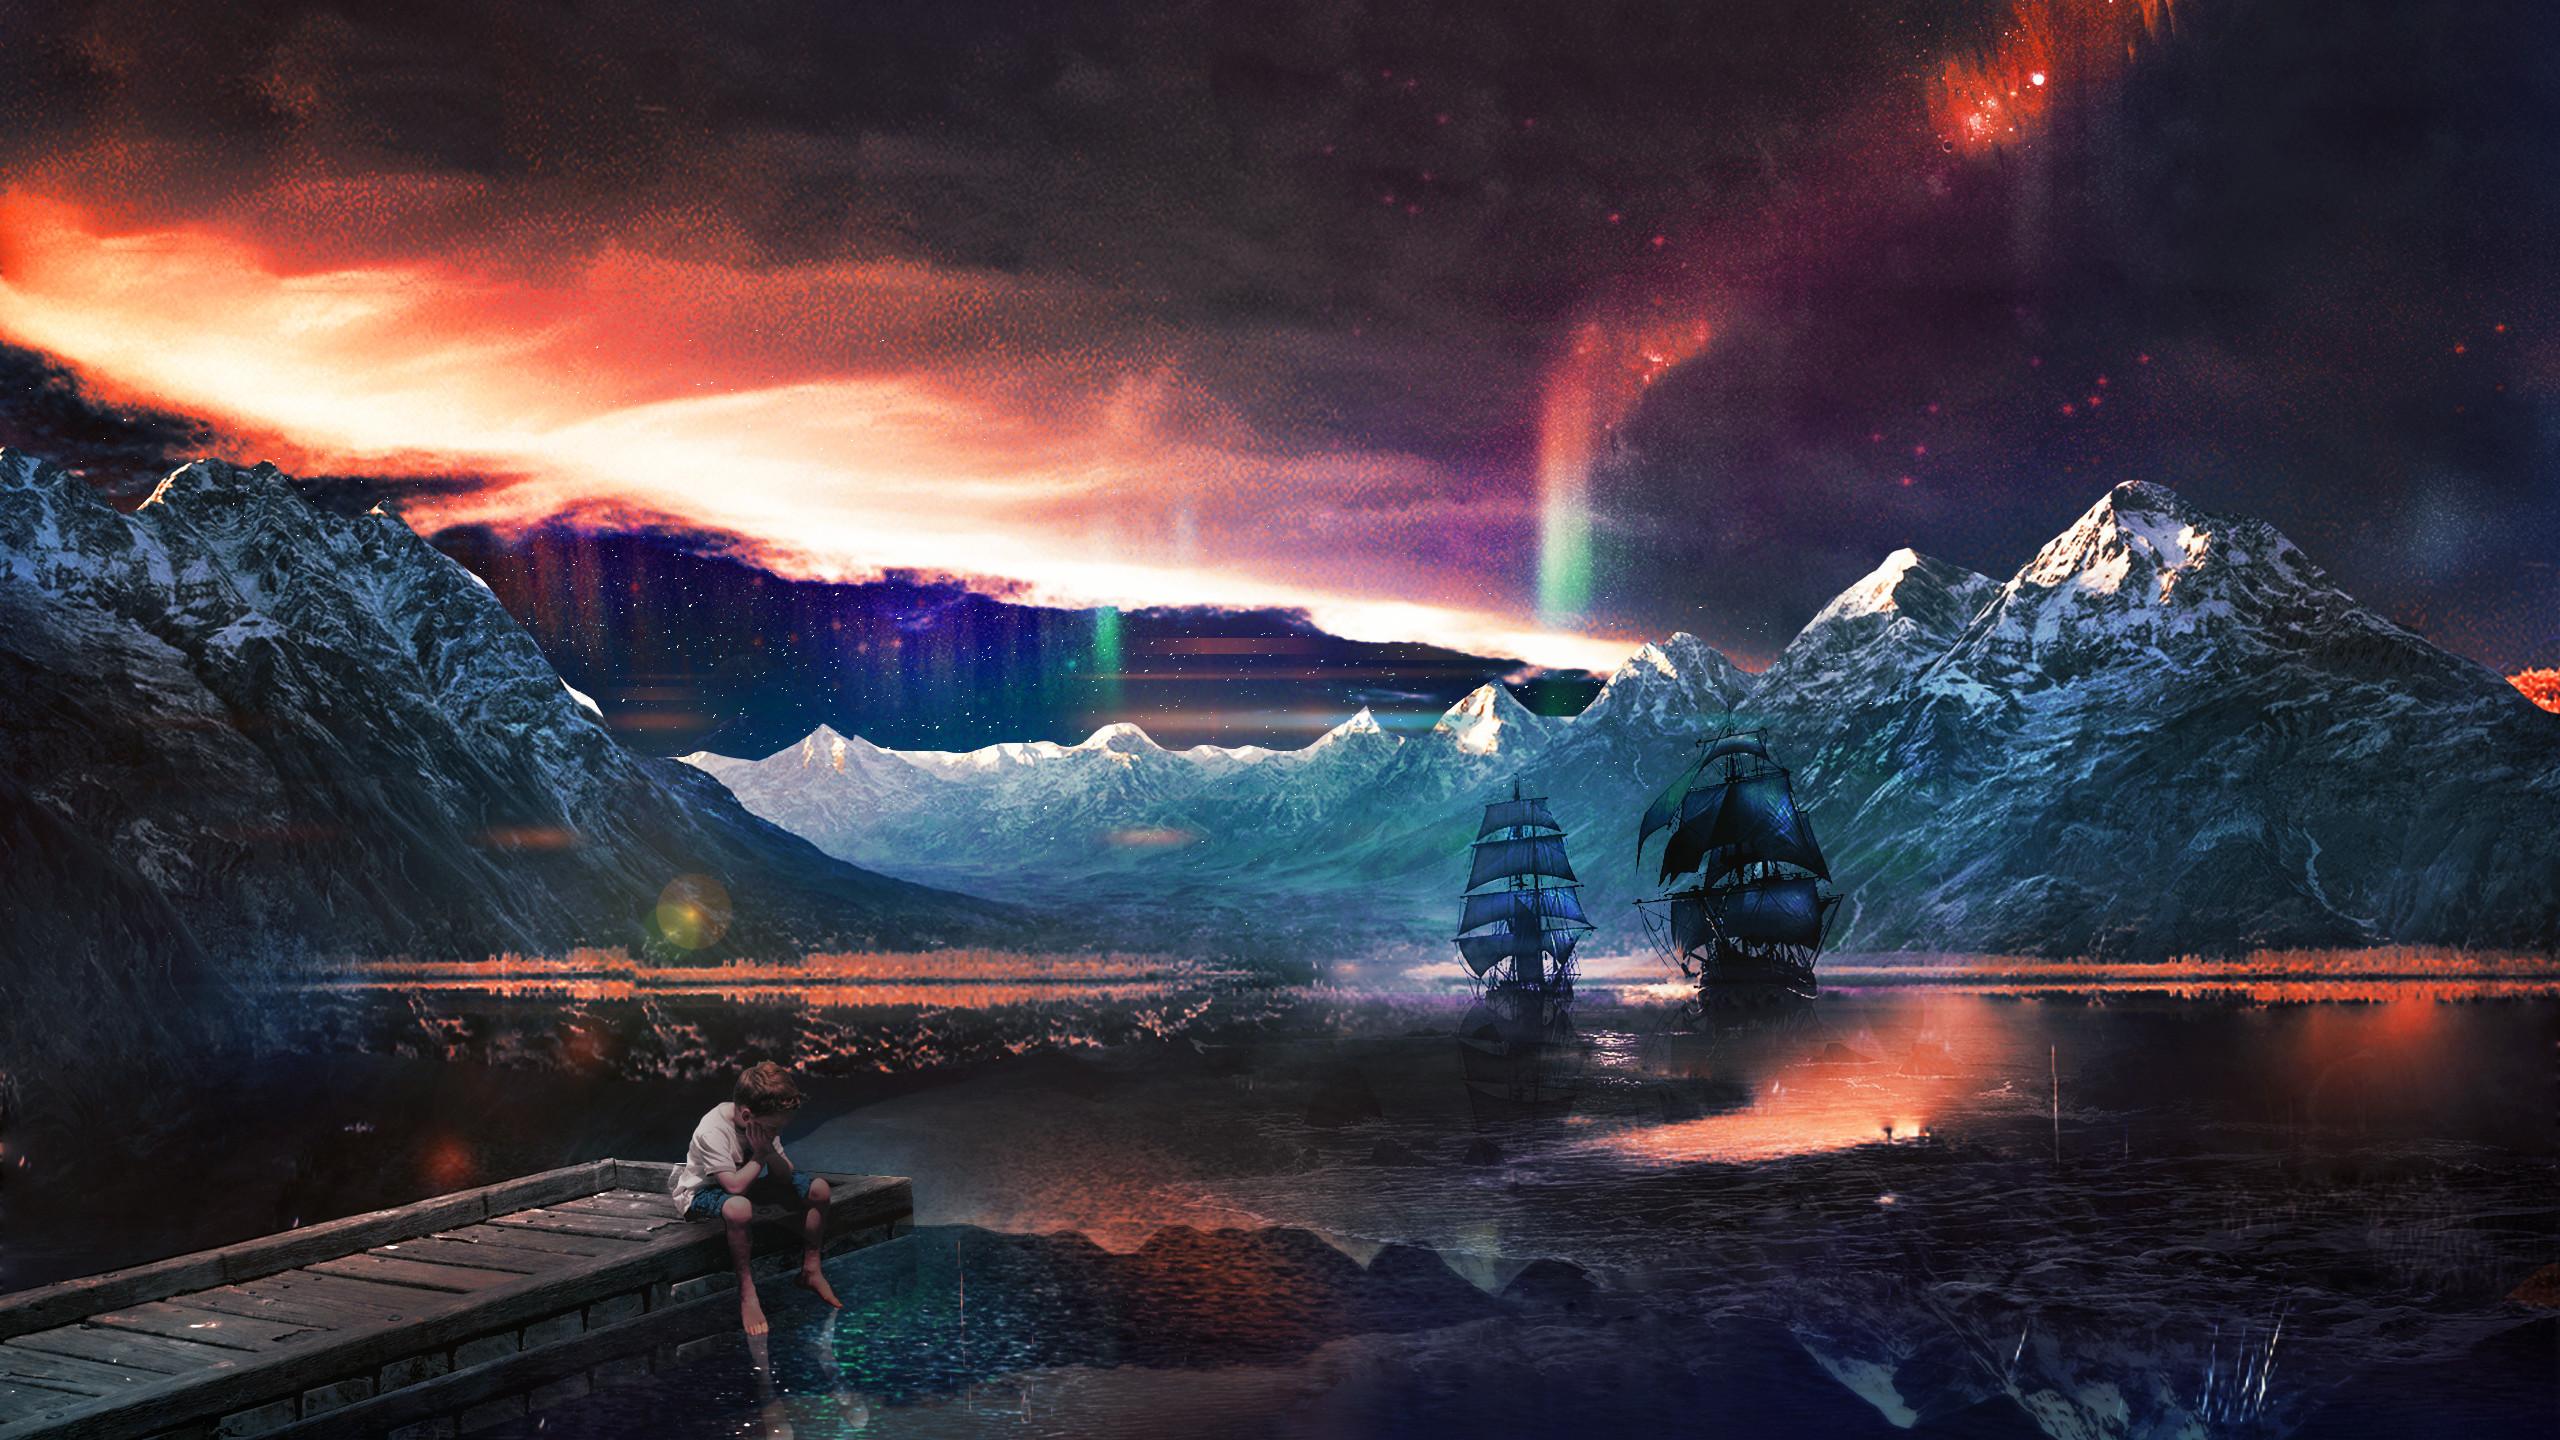 Res: 2560x1440, Space Fantasy Wallpaper